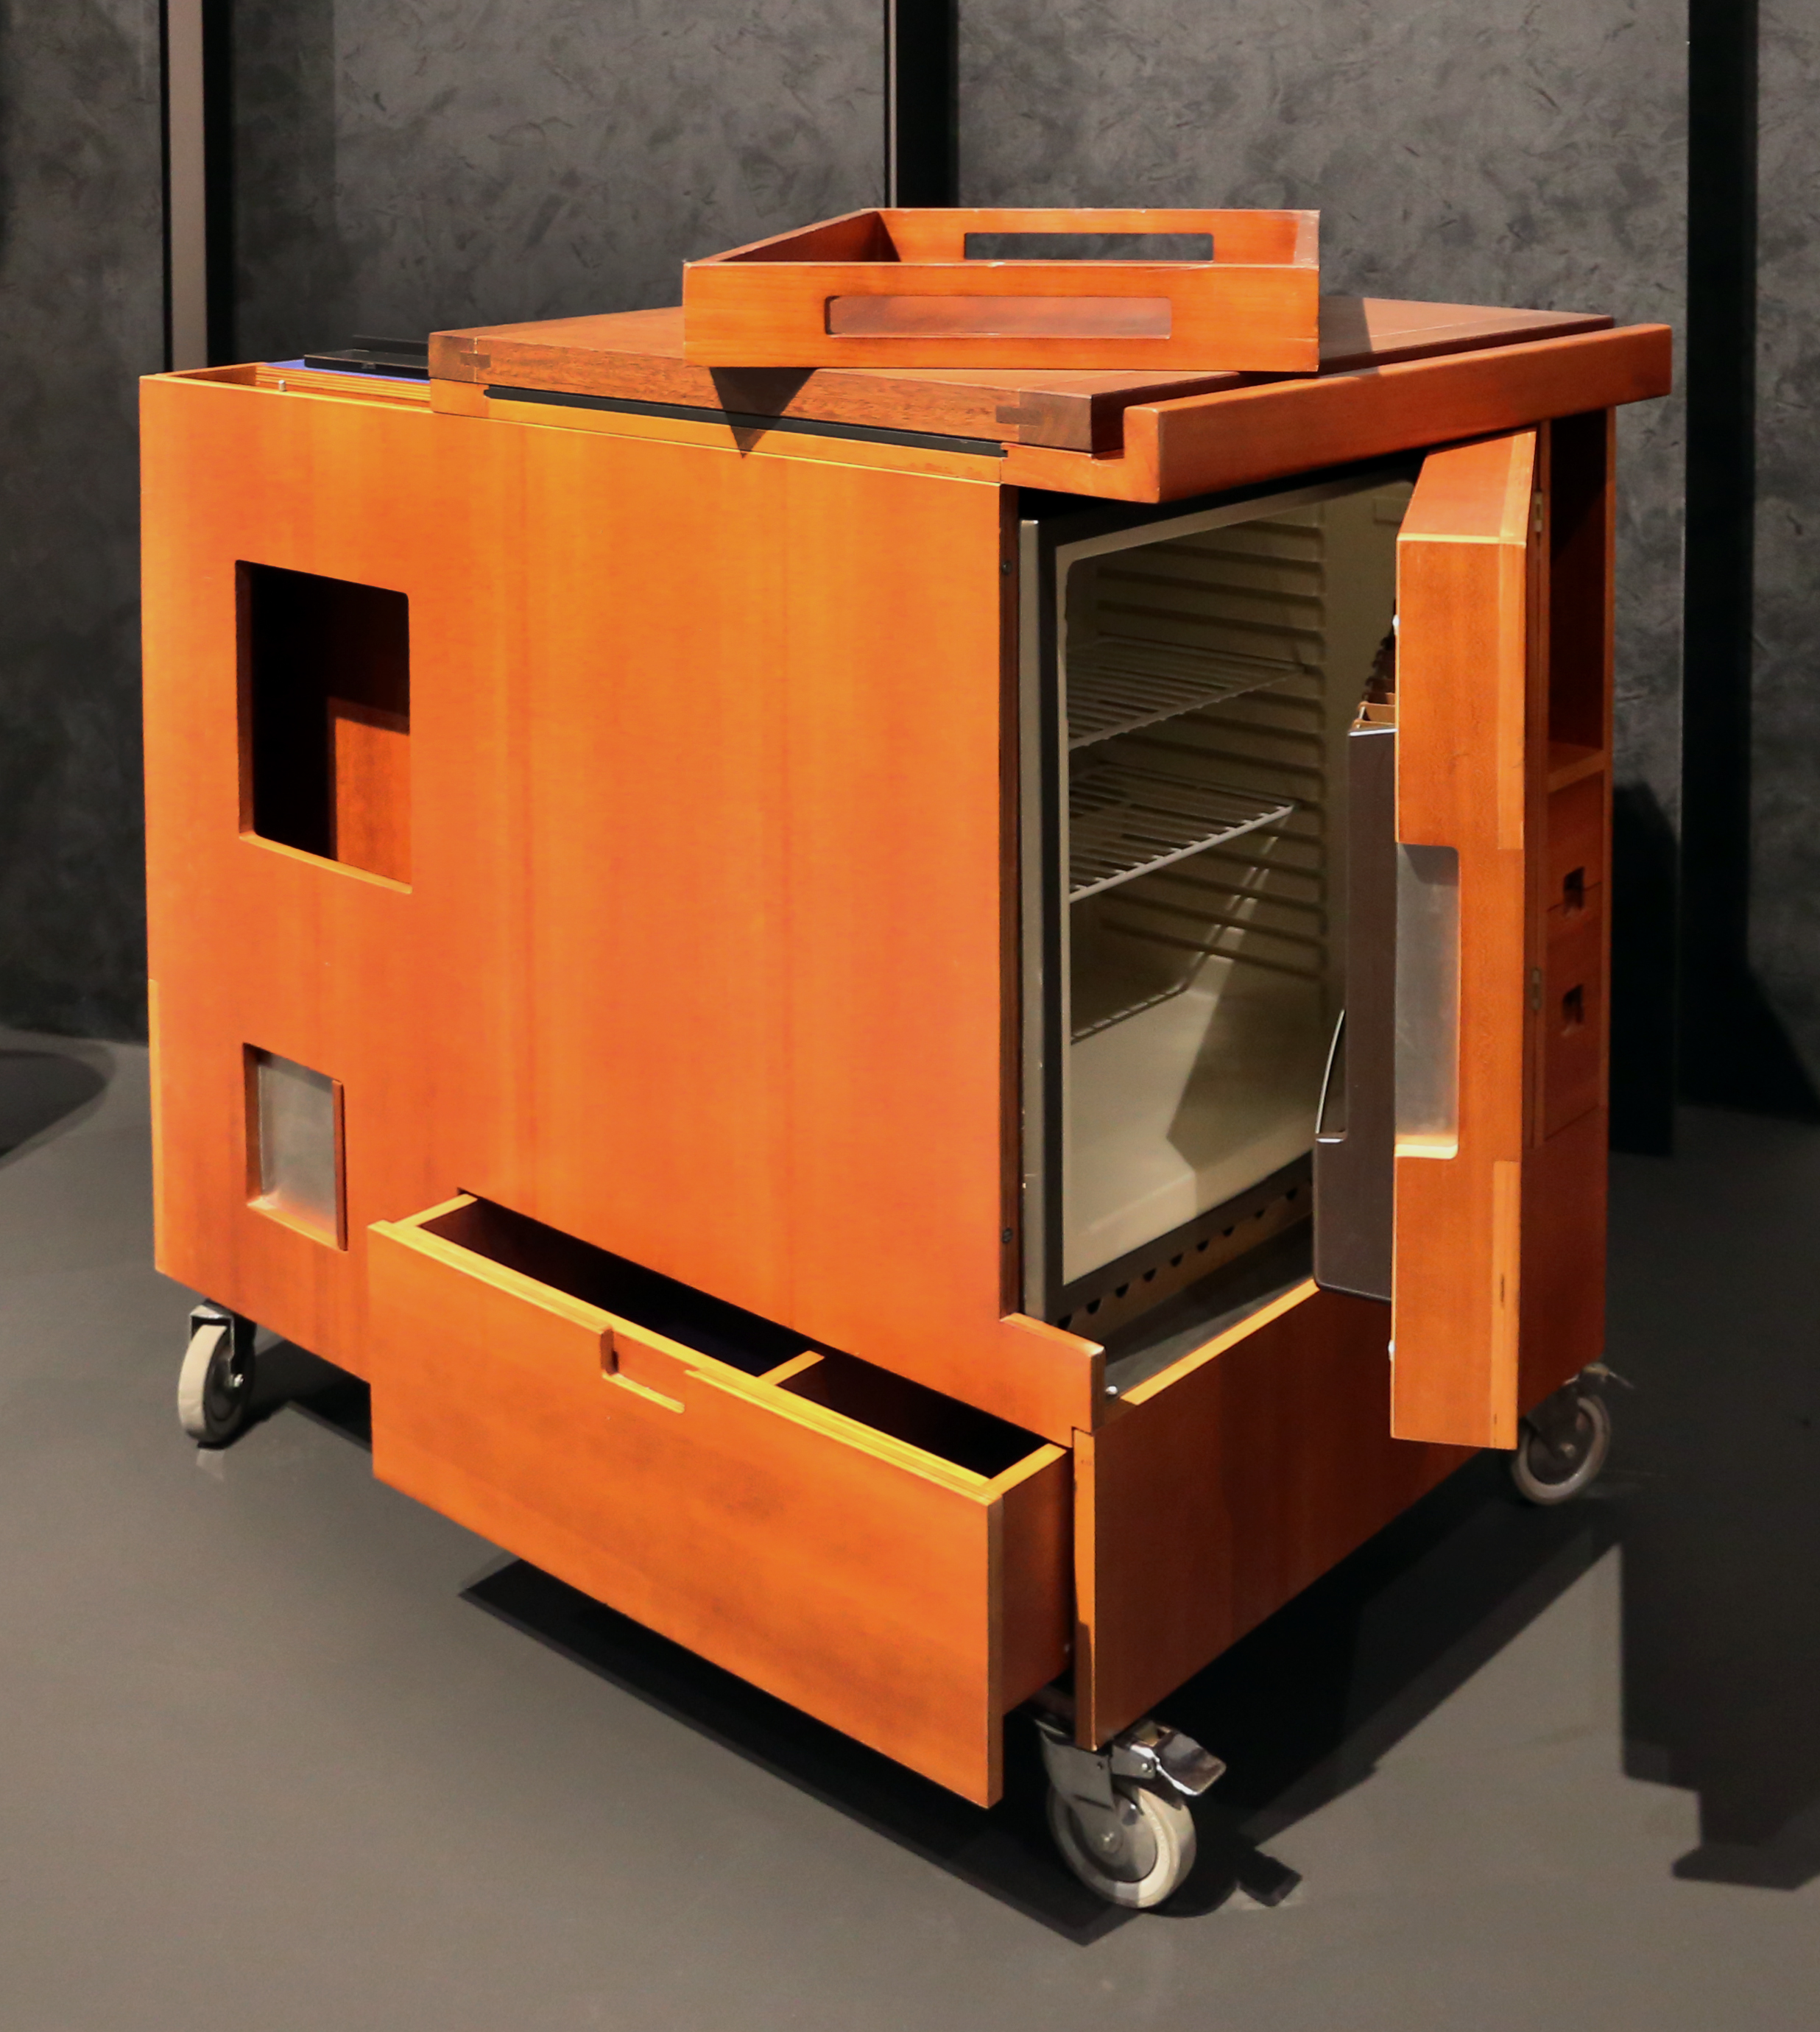 File:Joe colombo per boffi, mobile cucina minikitchen, 1964 ...